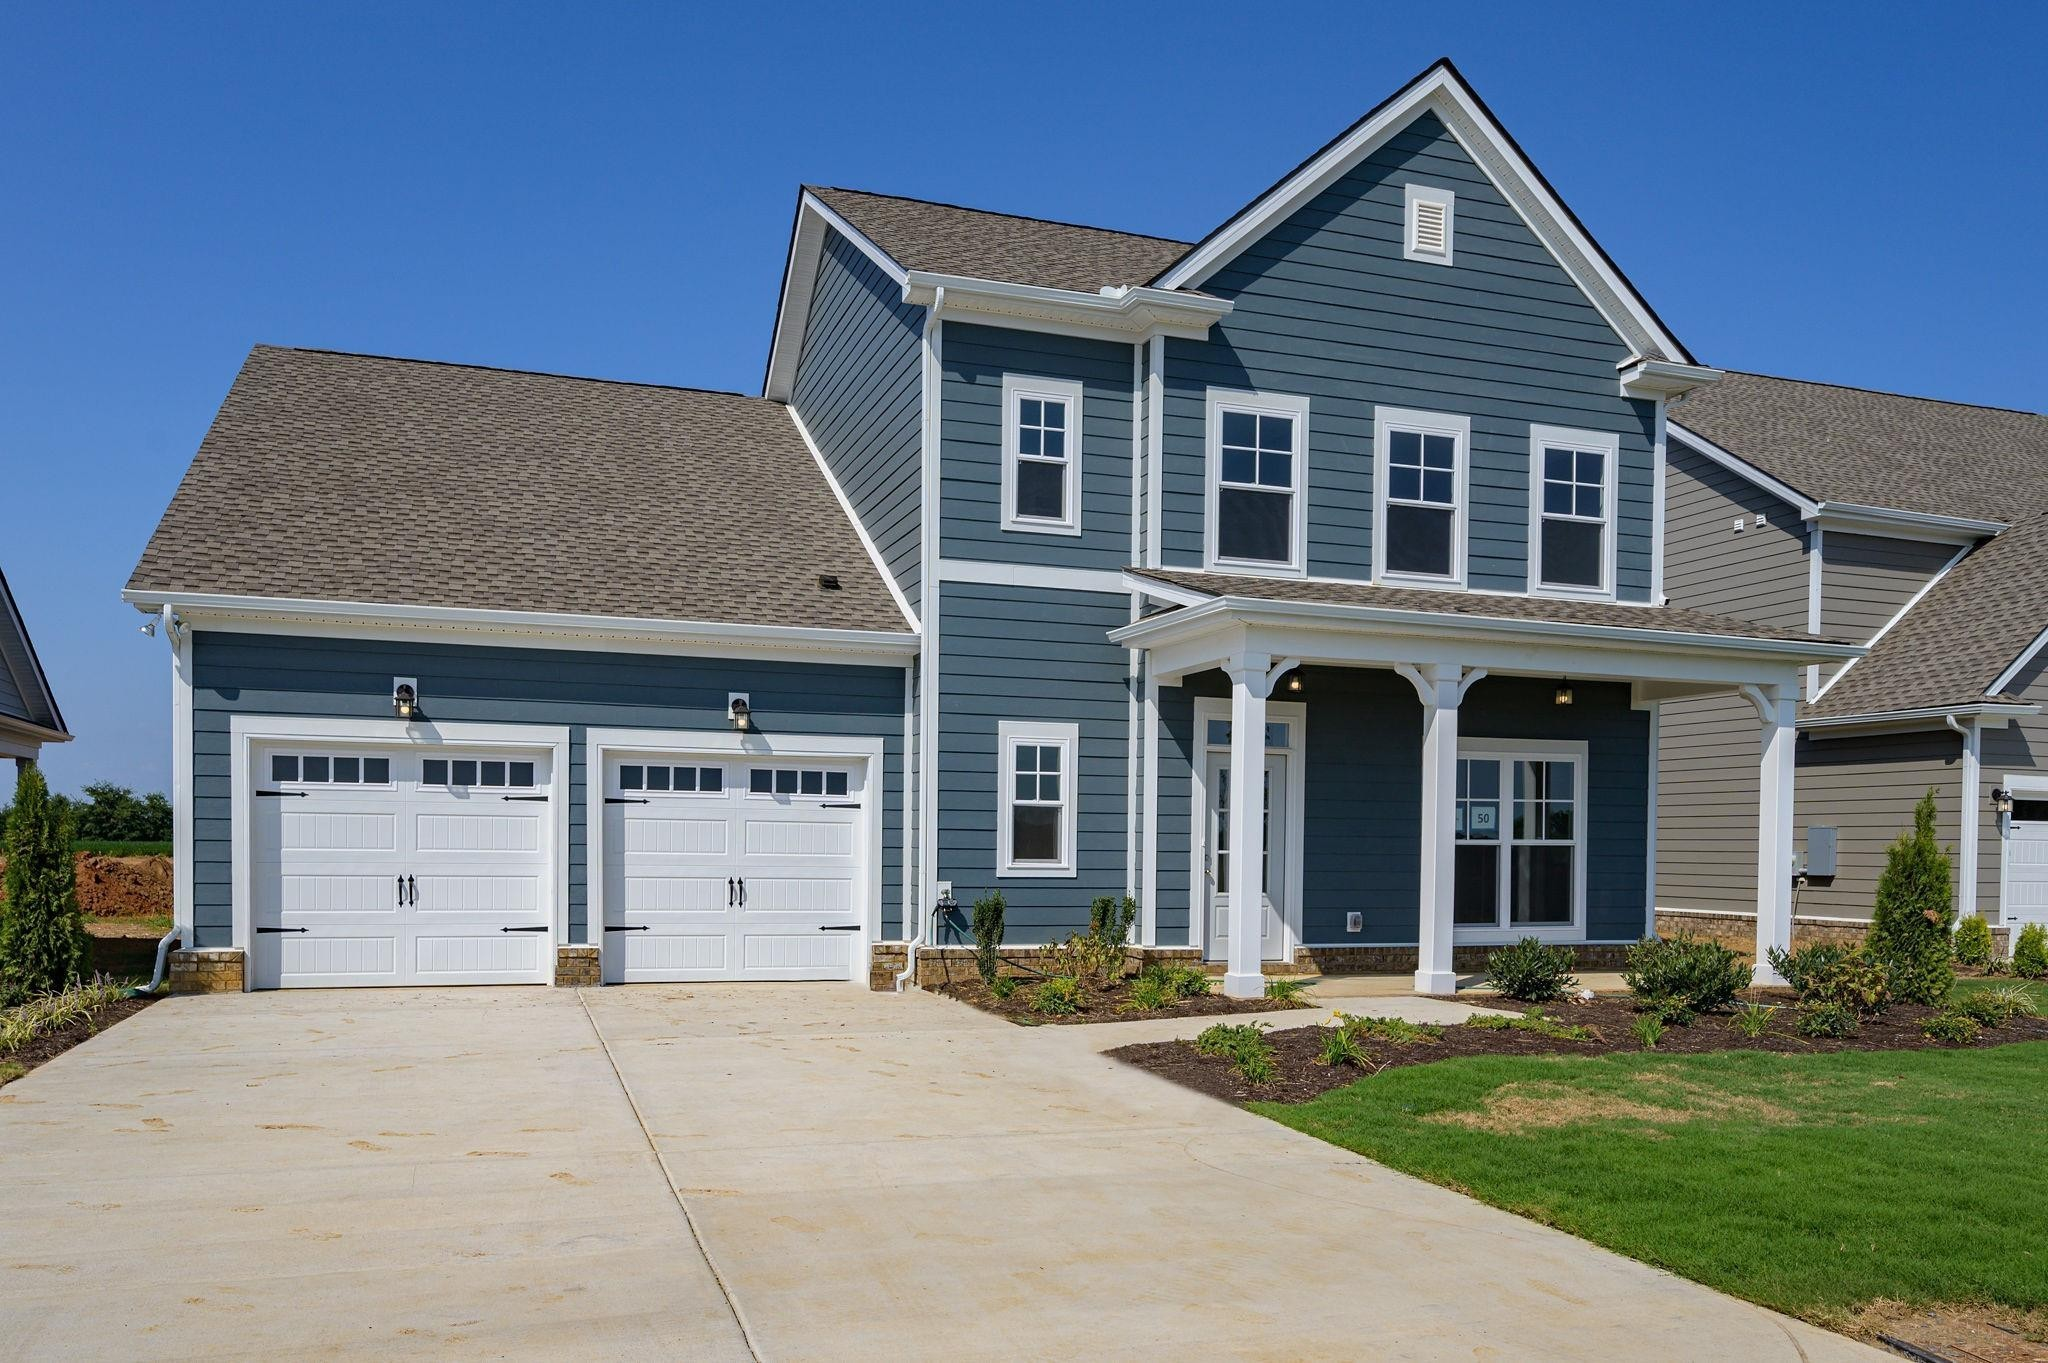 5508 Shelton Boulevard #42, Murfreesboro, TN 37129 - Murfreesboro, TN real estate listing